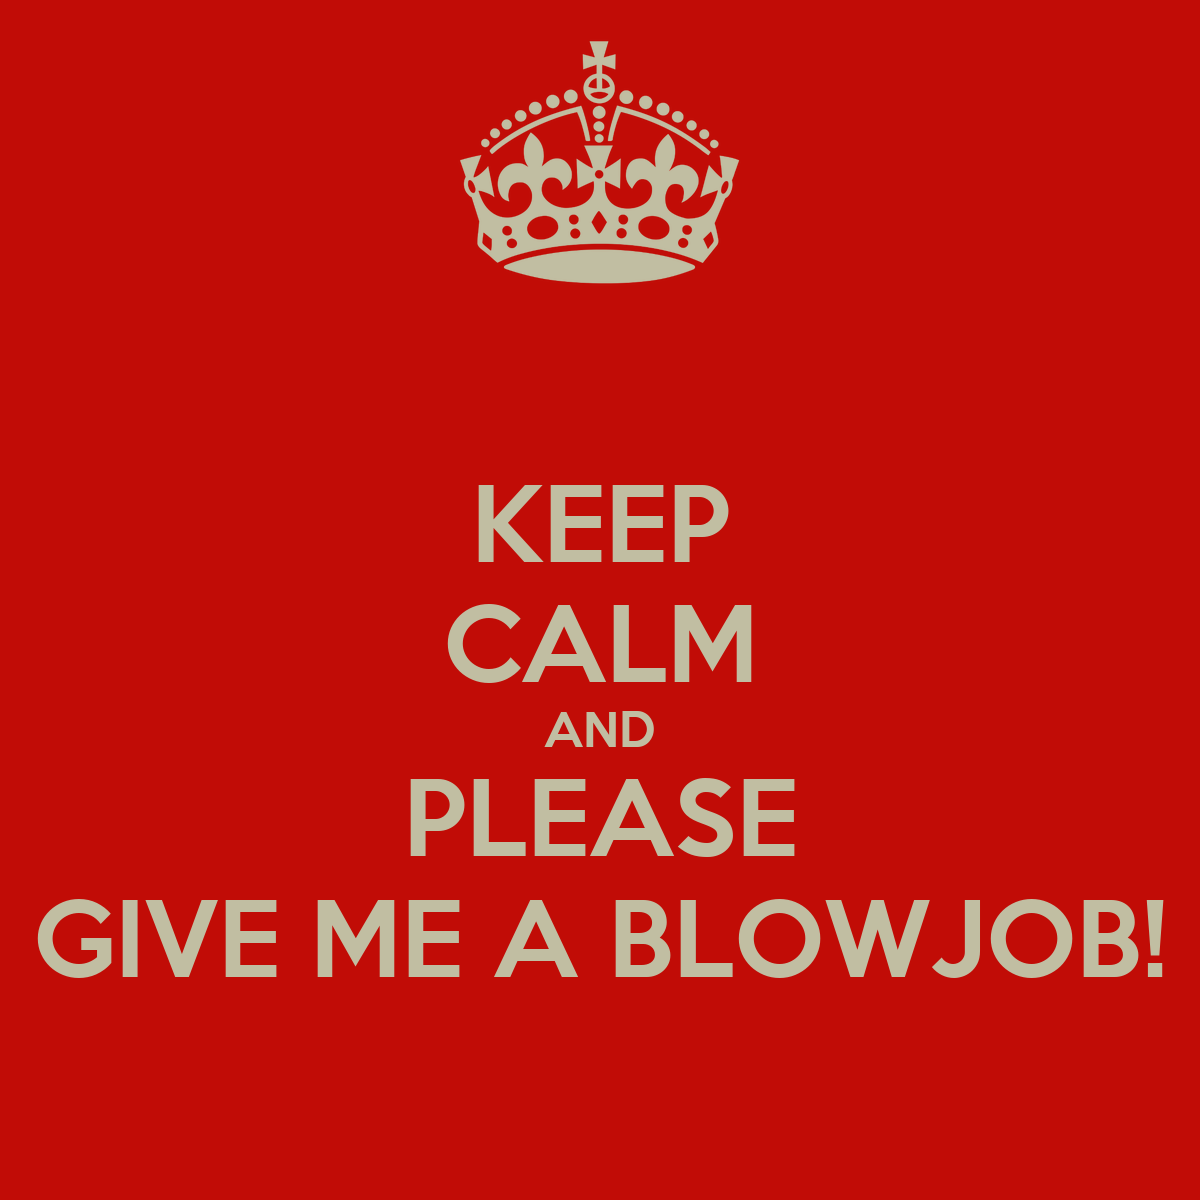 Give me a blowjob mature!